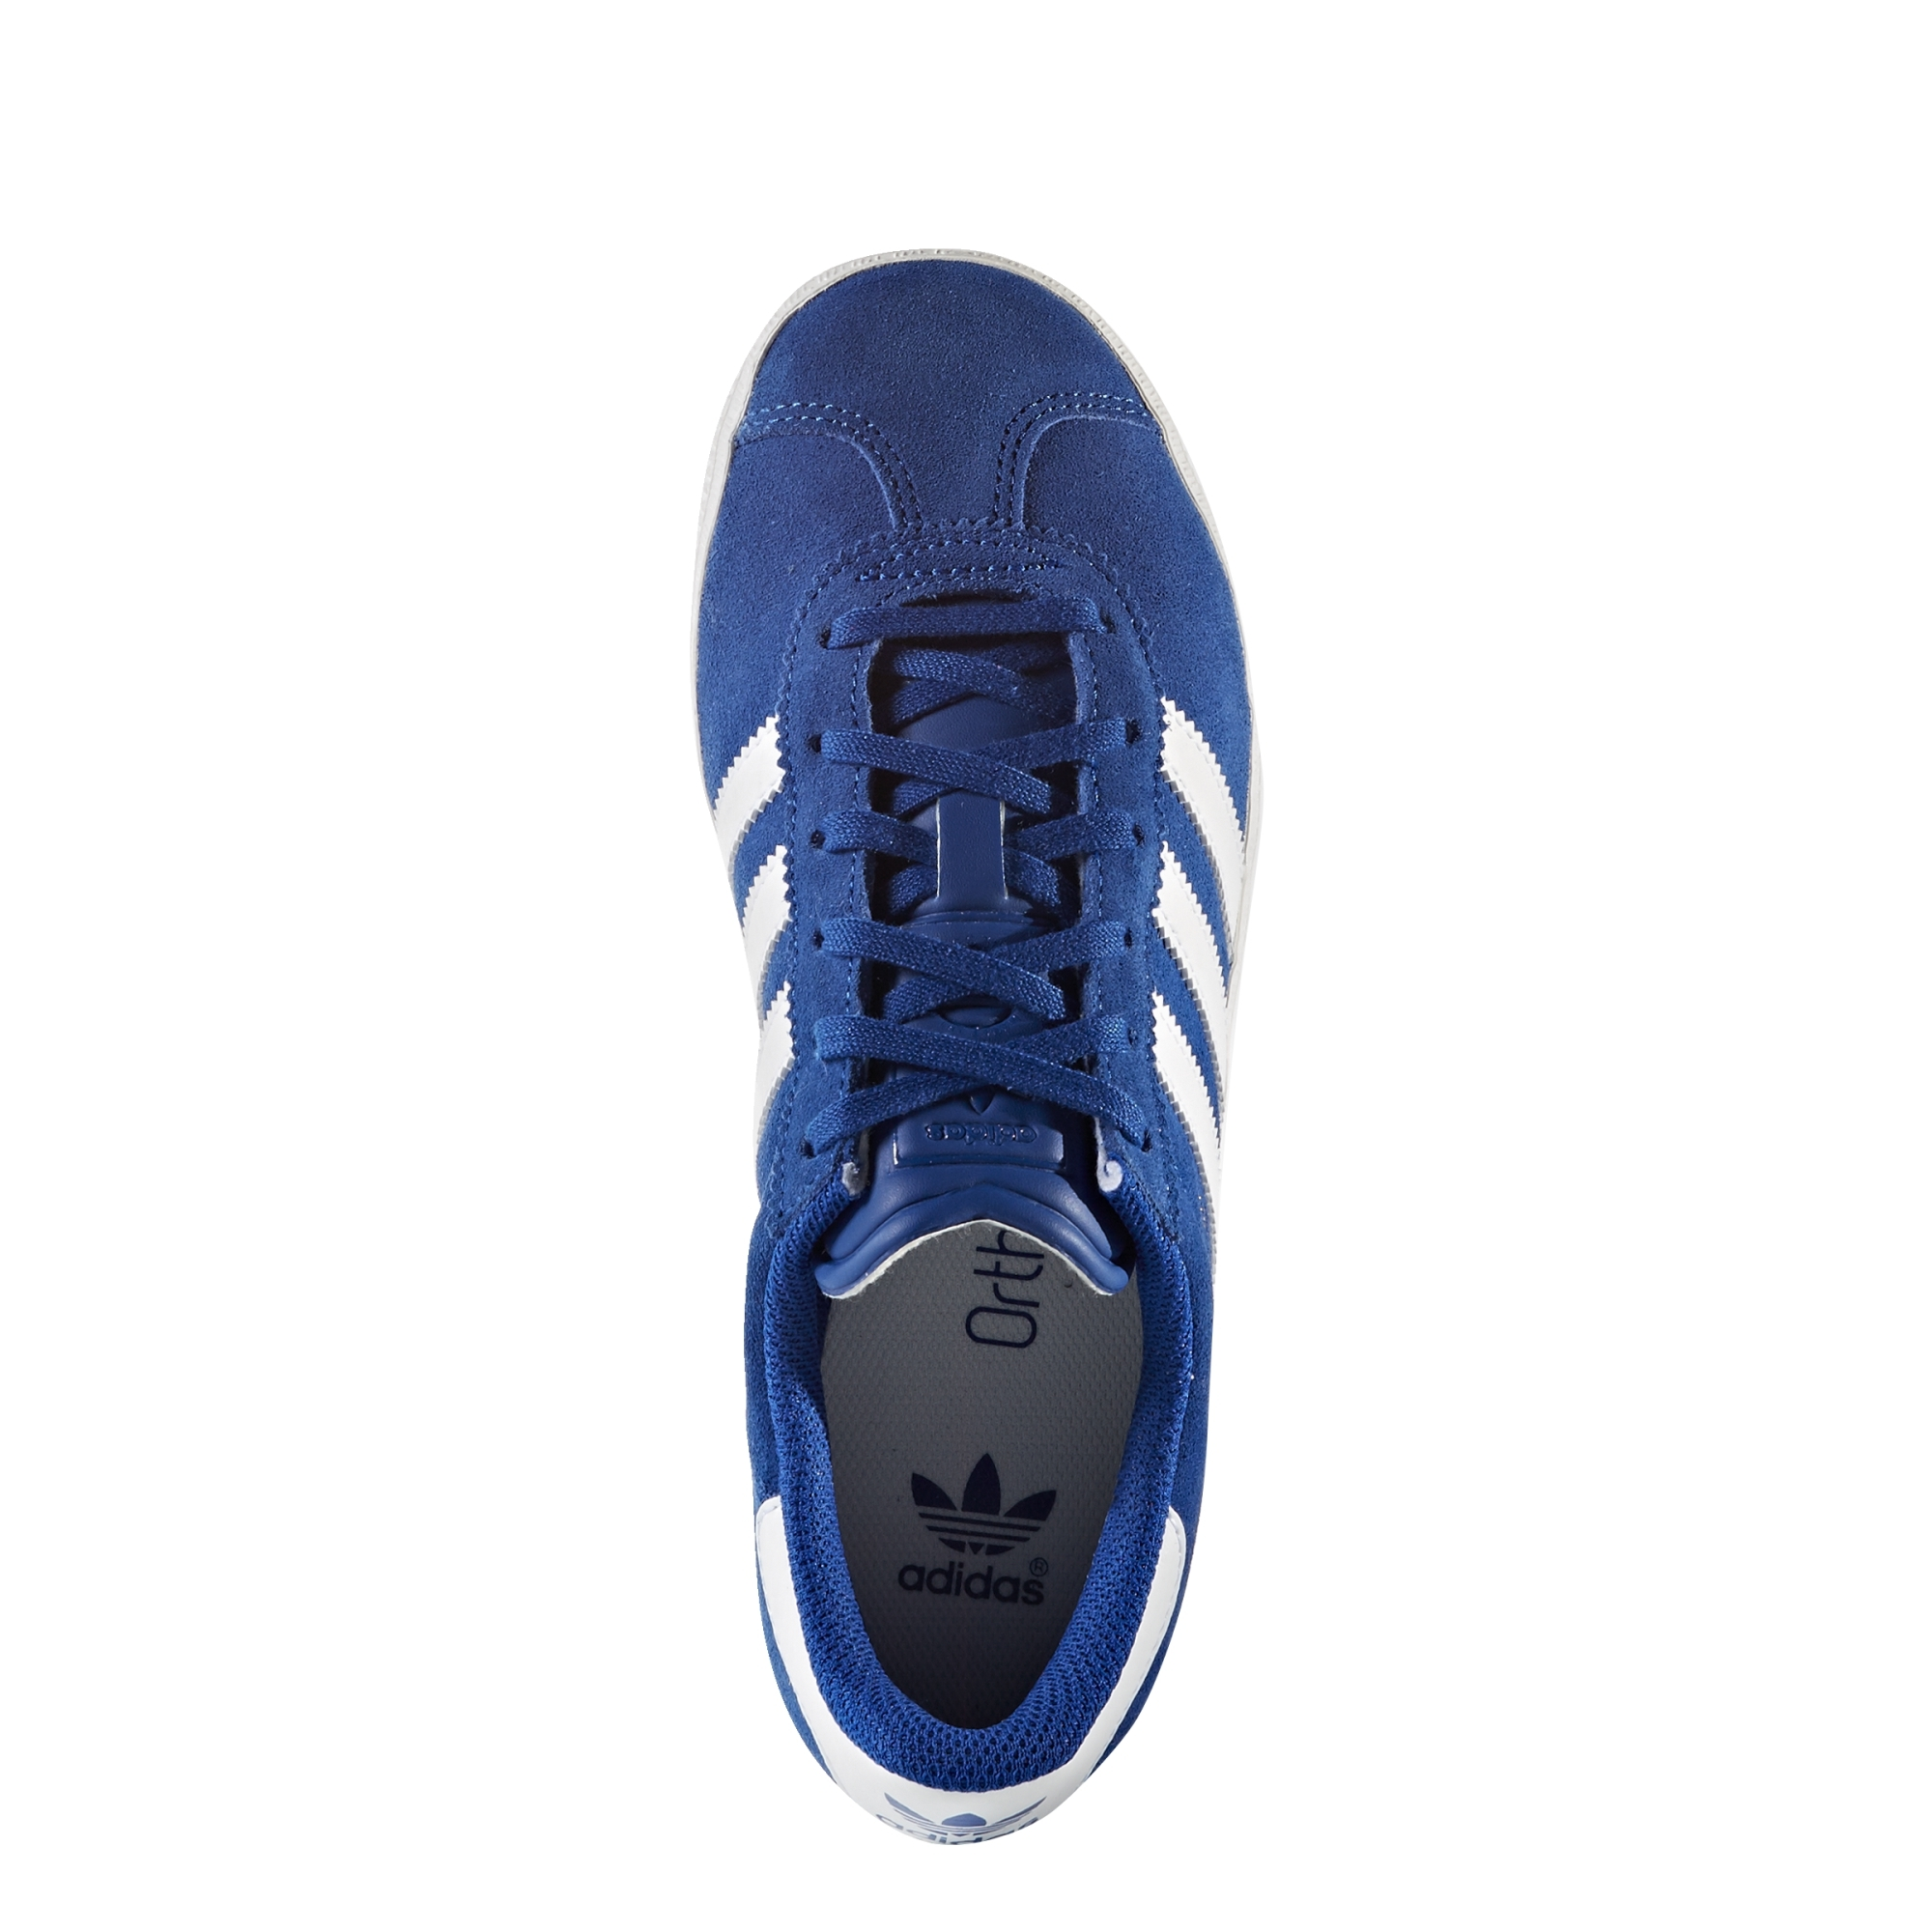 buty adidas gazelle 2 j